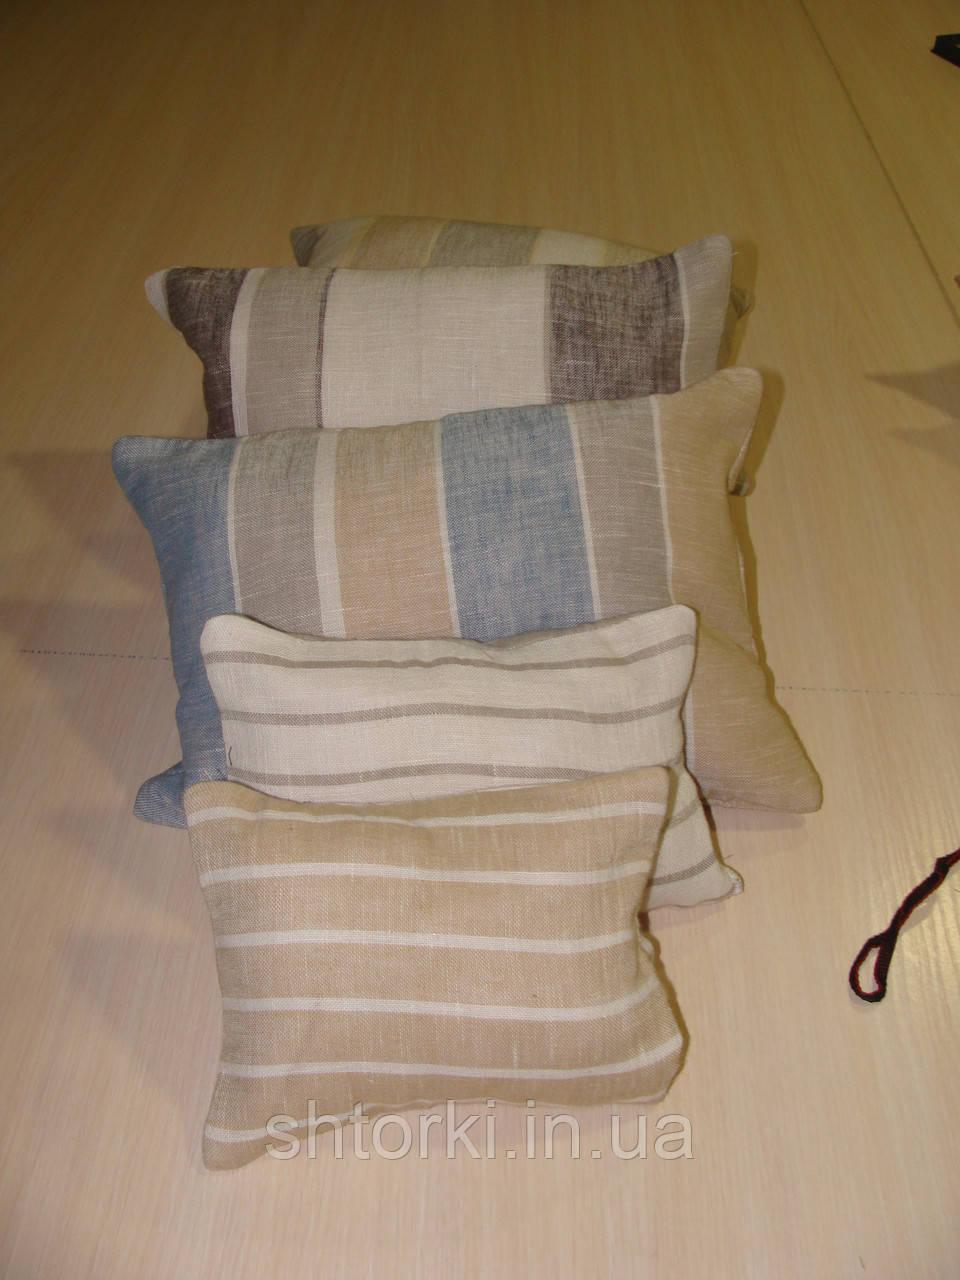 Комплект подушек  полосочка натуралка, 5шт